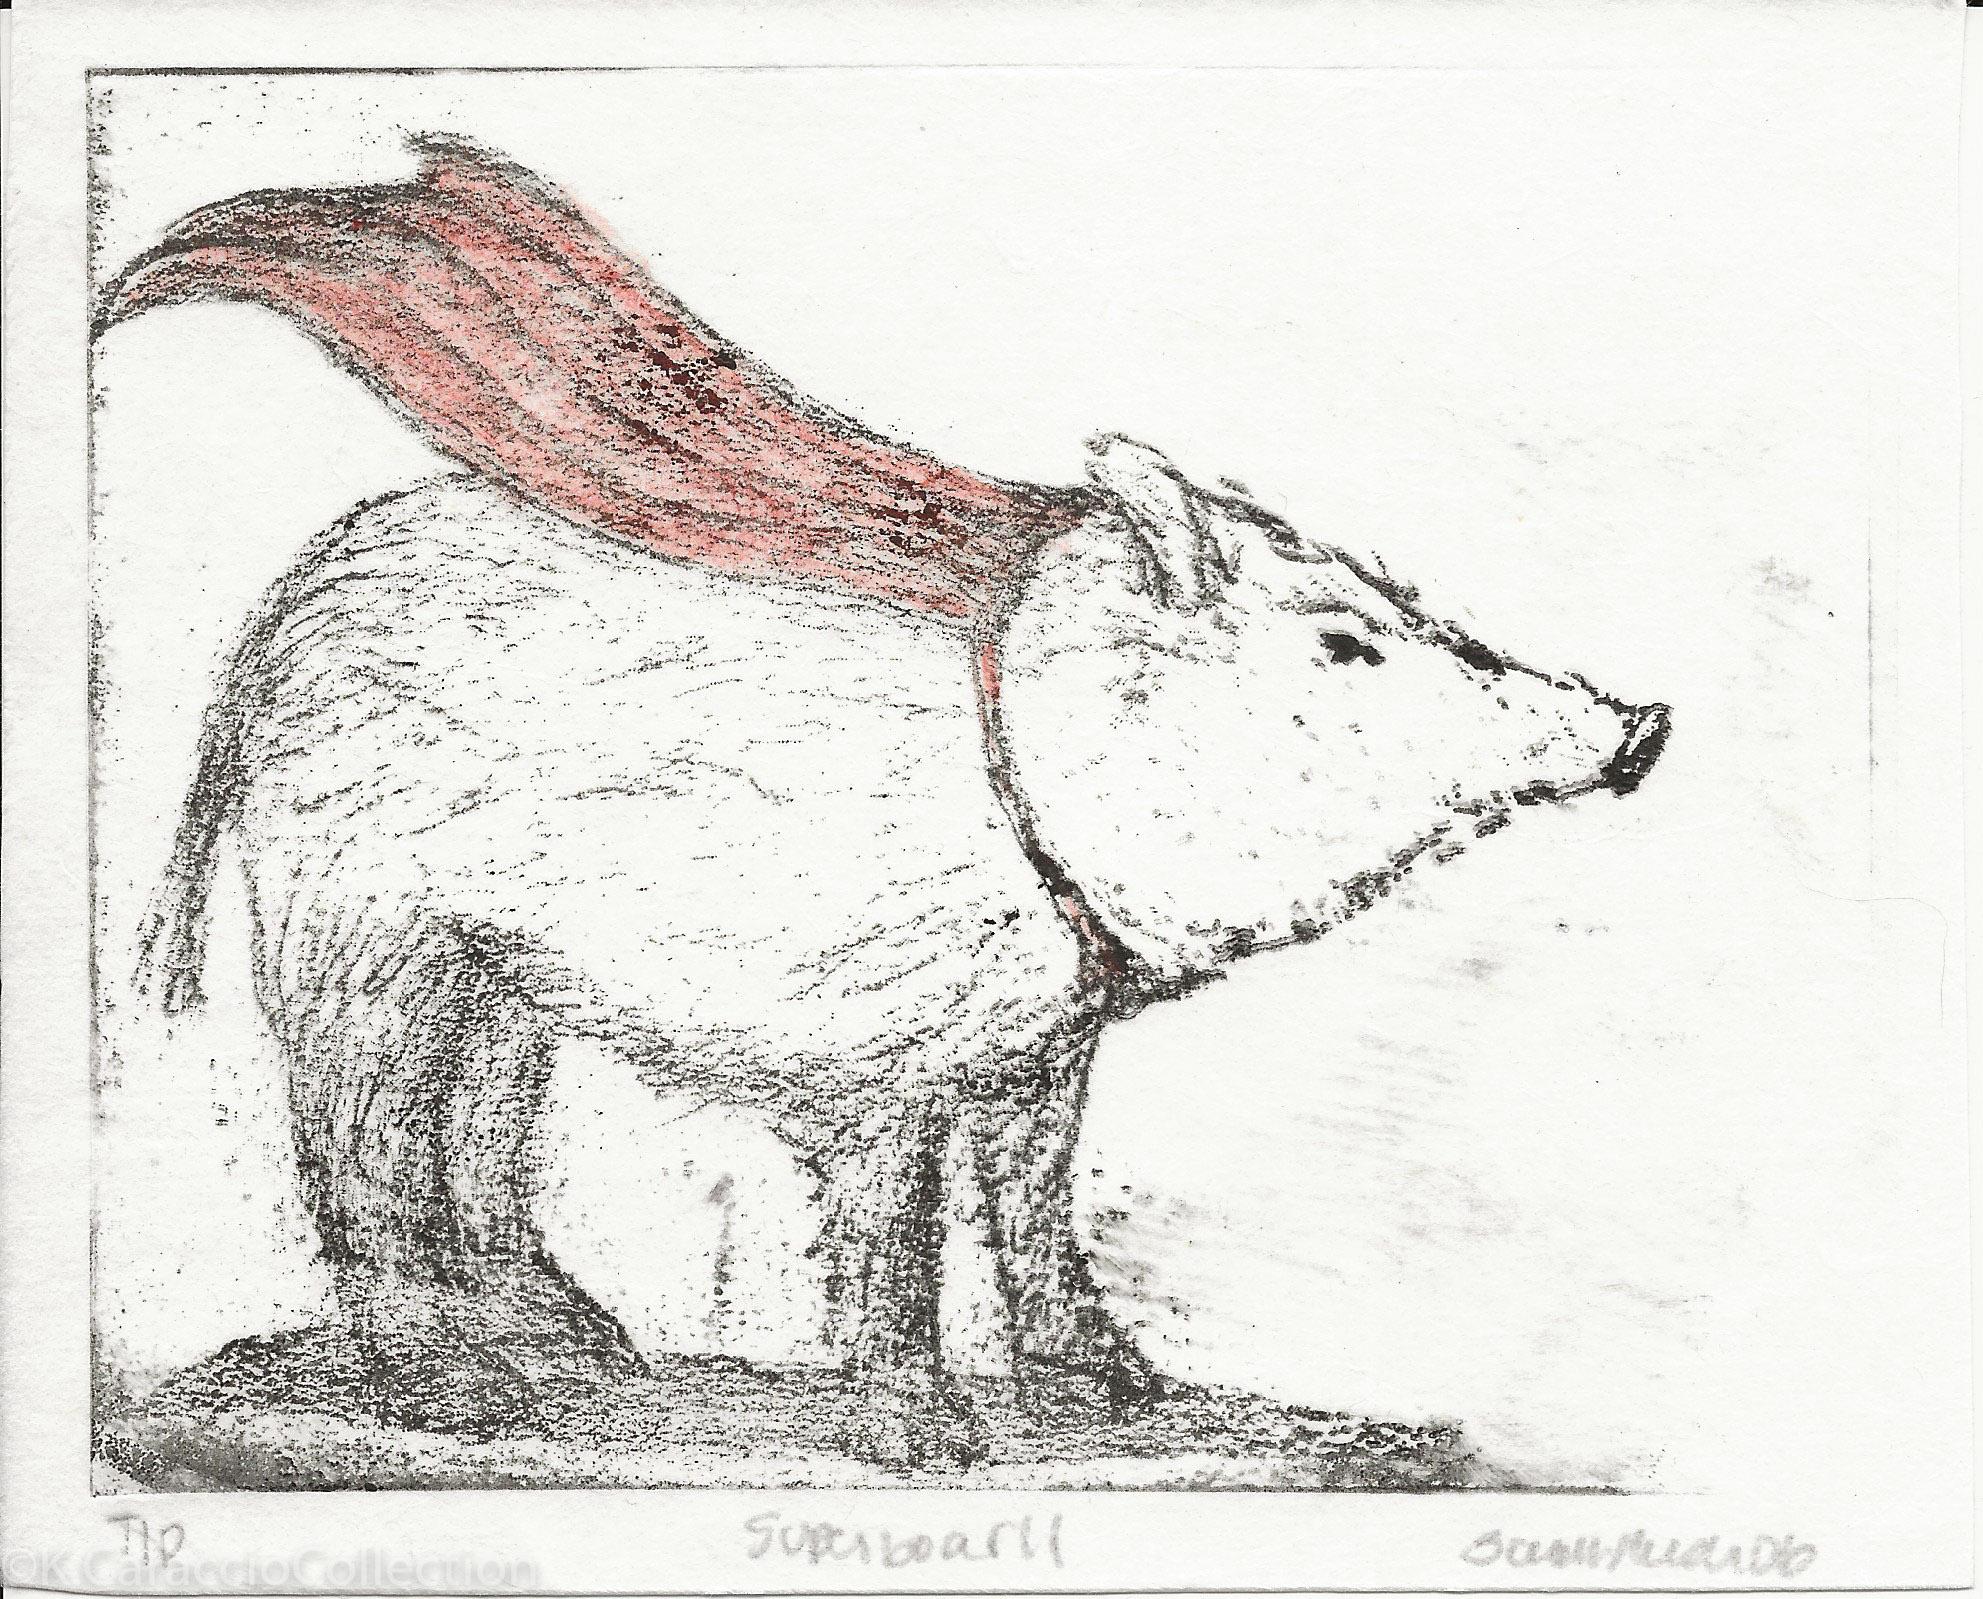 Superboar II, 2006